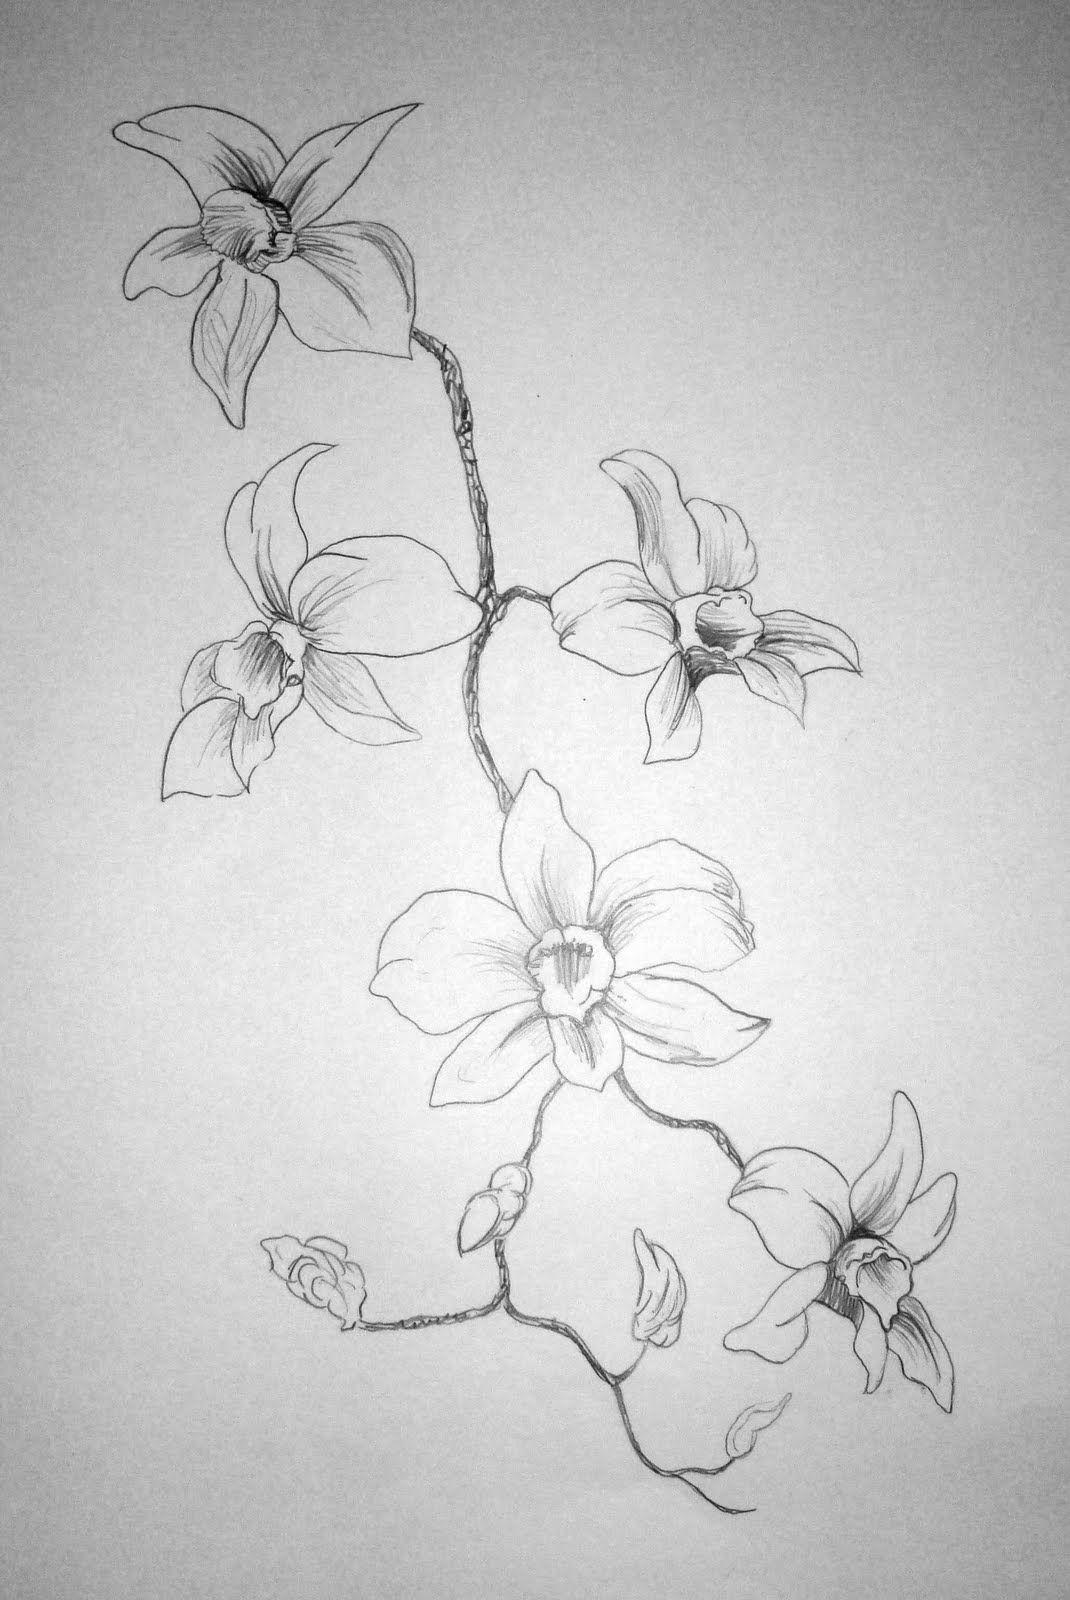 Flower pencil drawings hd wallpaper